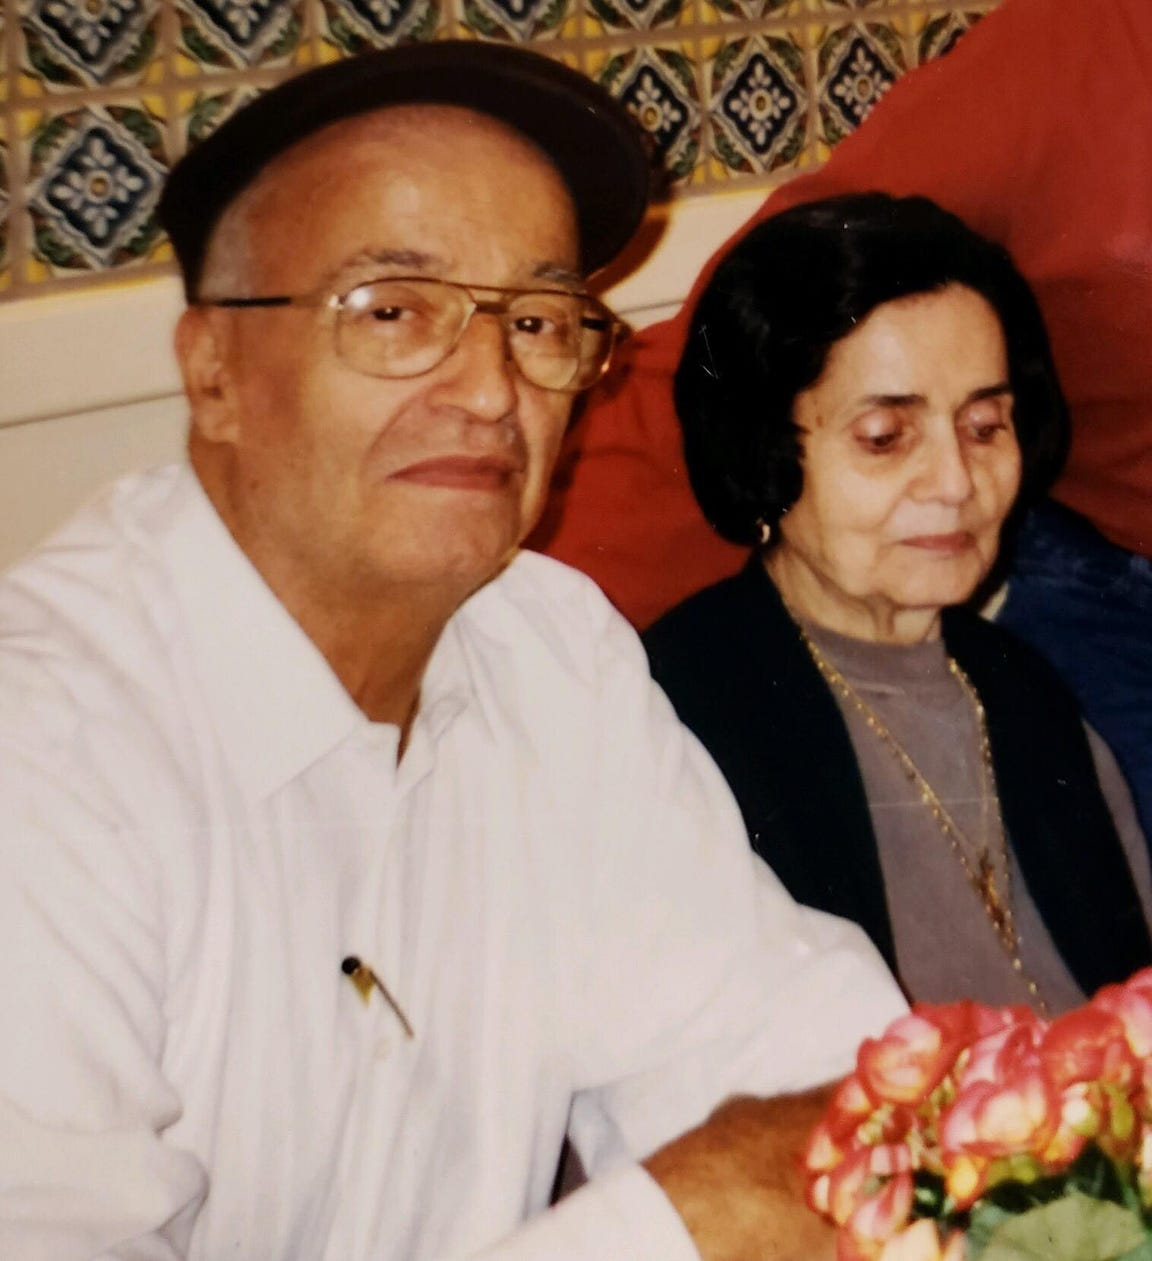 Elias and Mariette Bitar